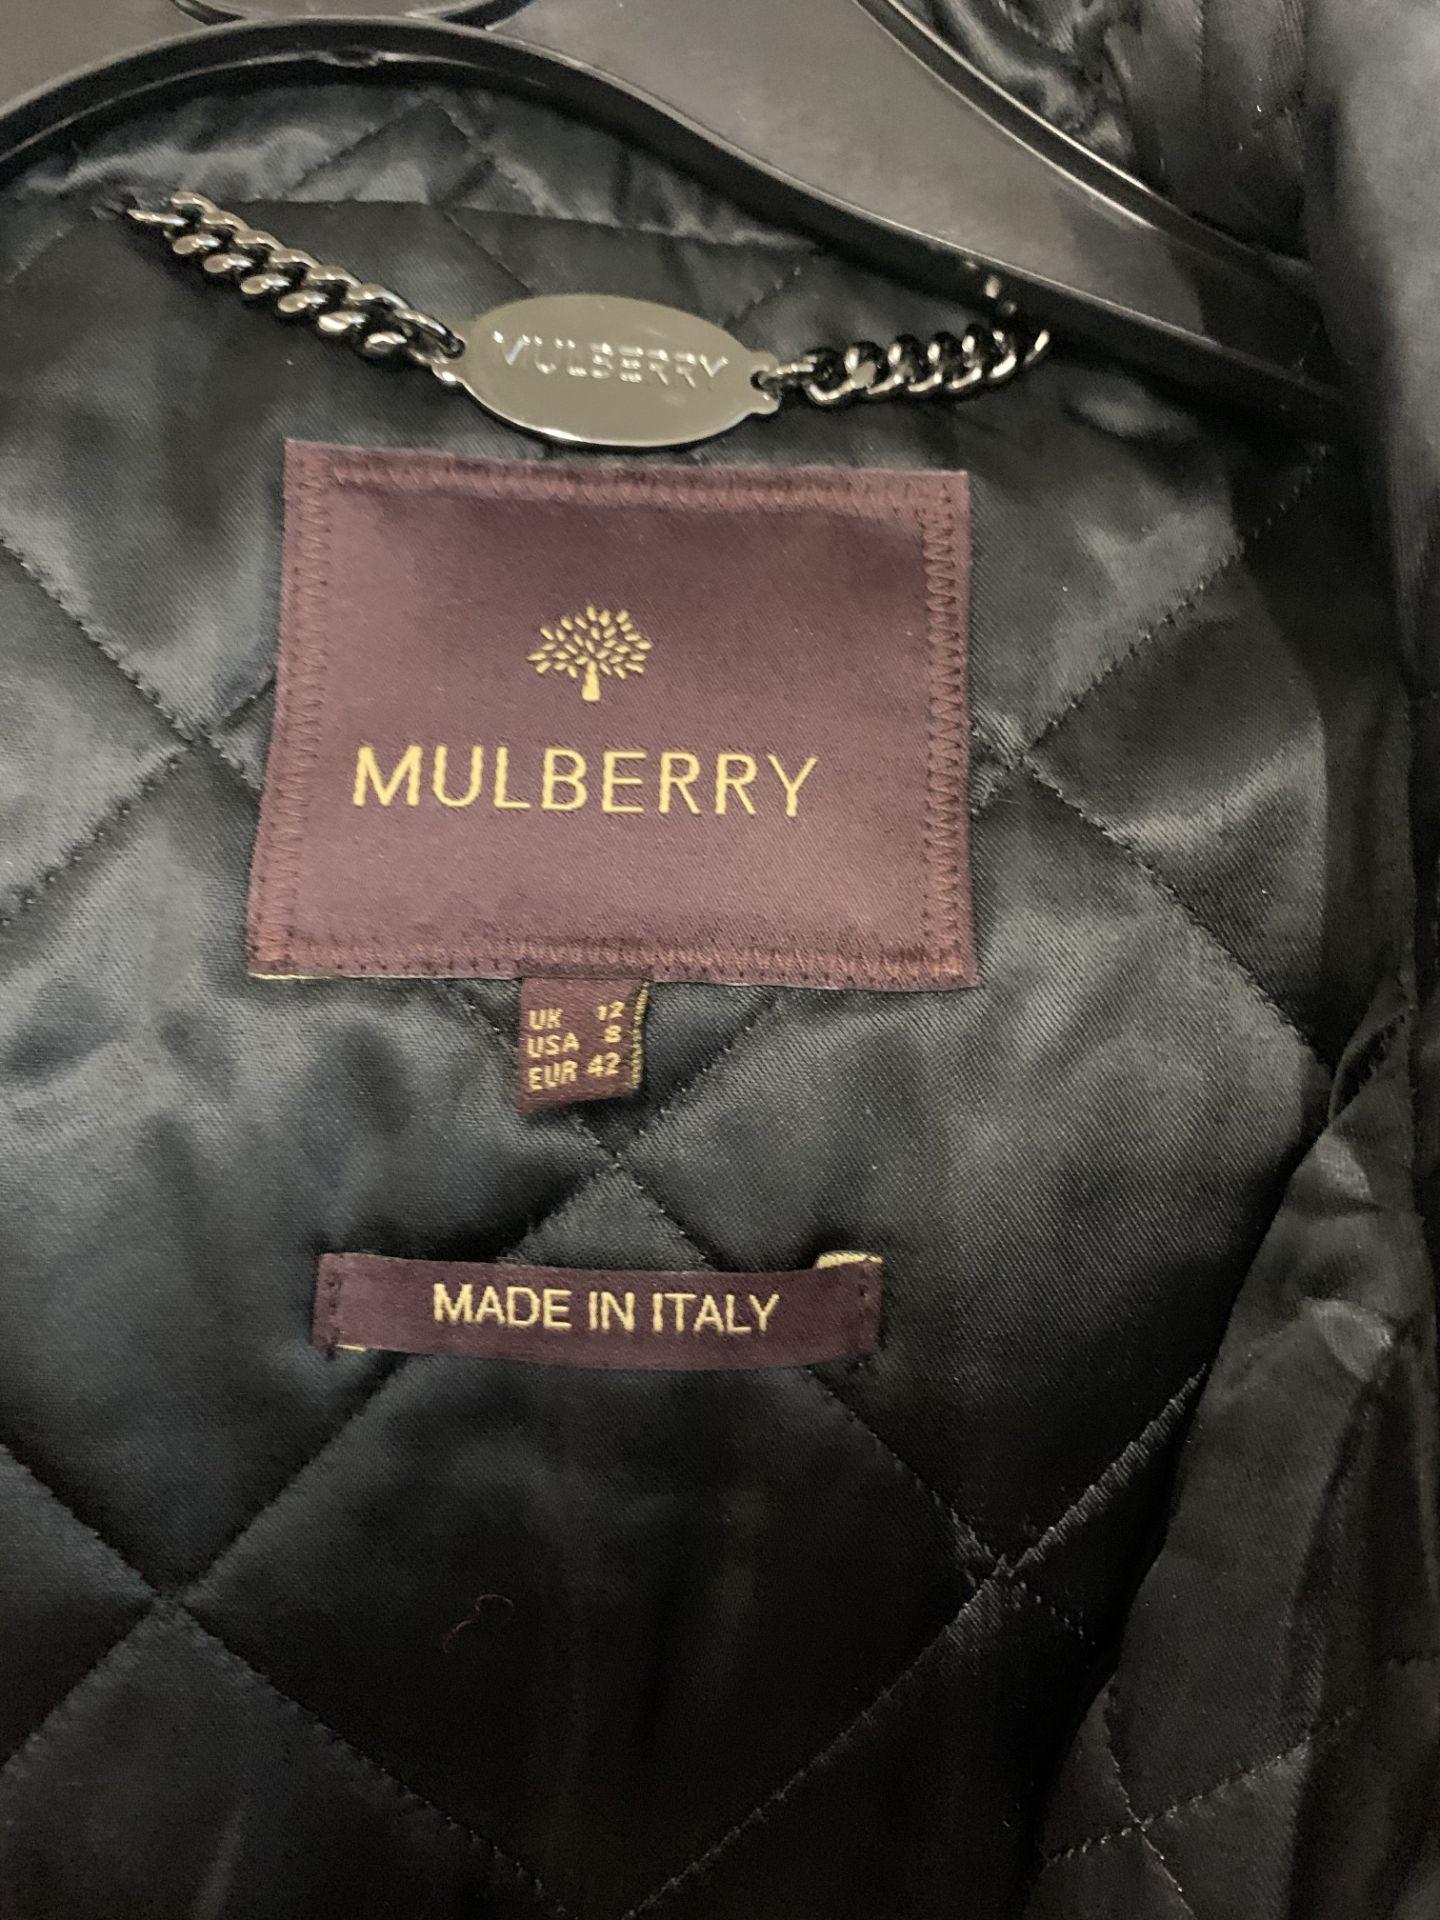 Lot 60 - Mulberry women's wintert coat